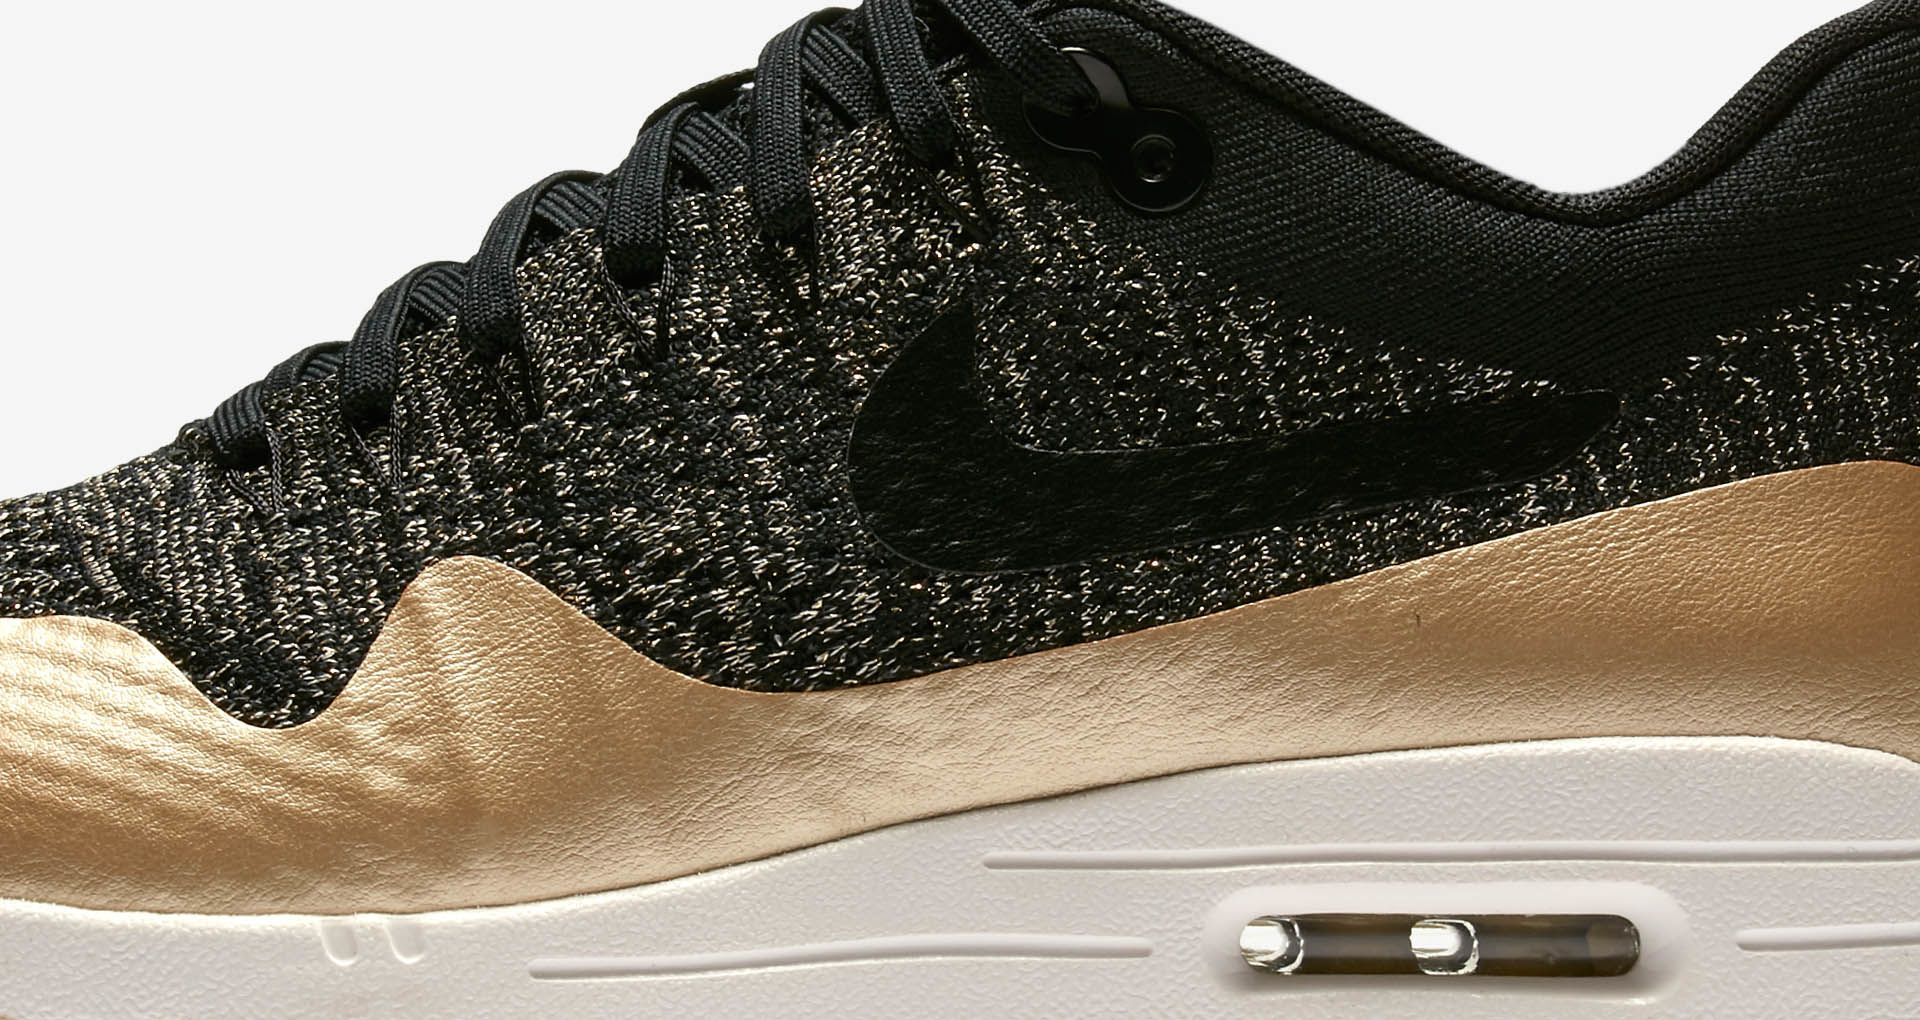 4a83c8c35c Women's Nike Air Max 1 Ultra 2.0 Flyknit Metallic 'Black & Metallic Gold'